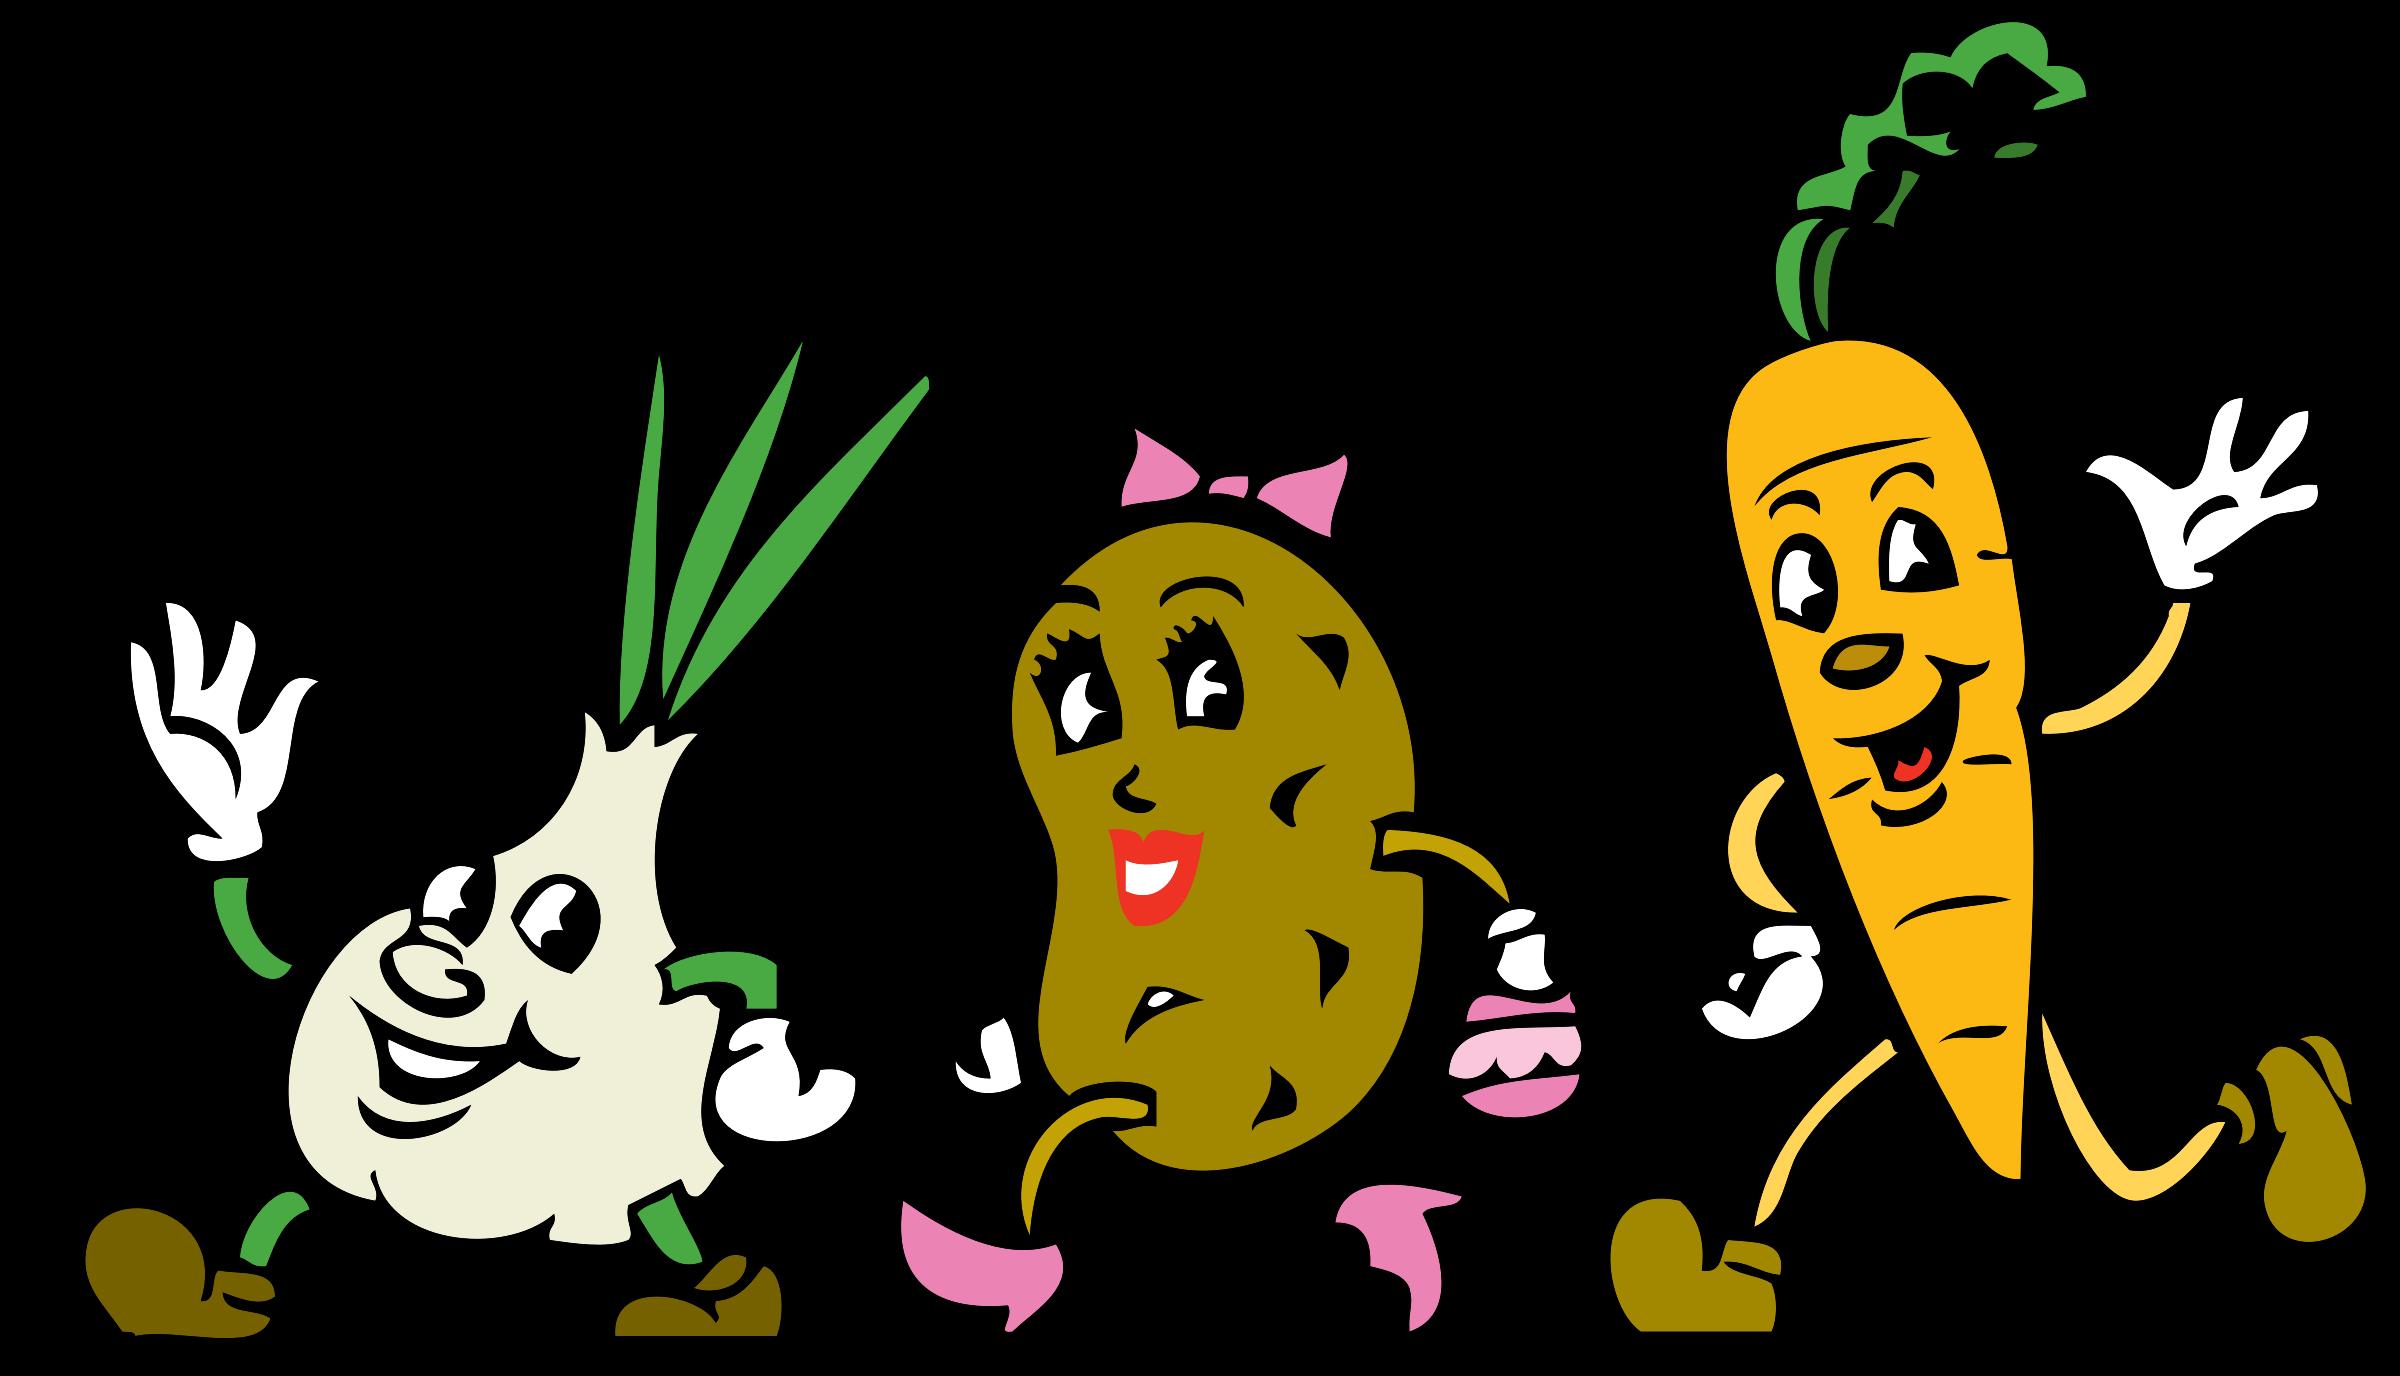 Clipart people vegetable. Veggies big image png